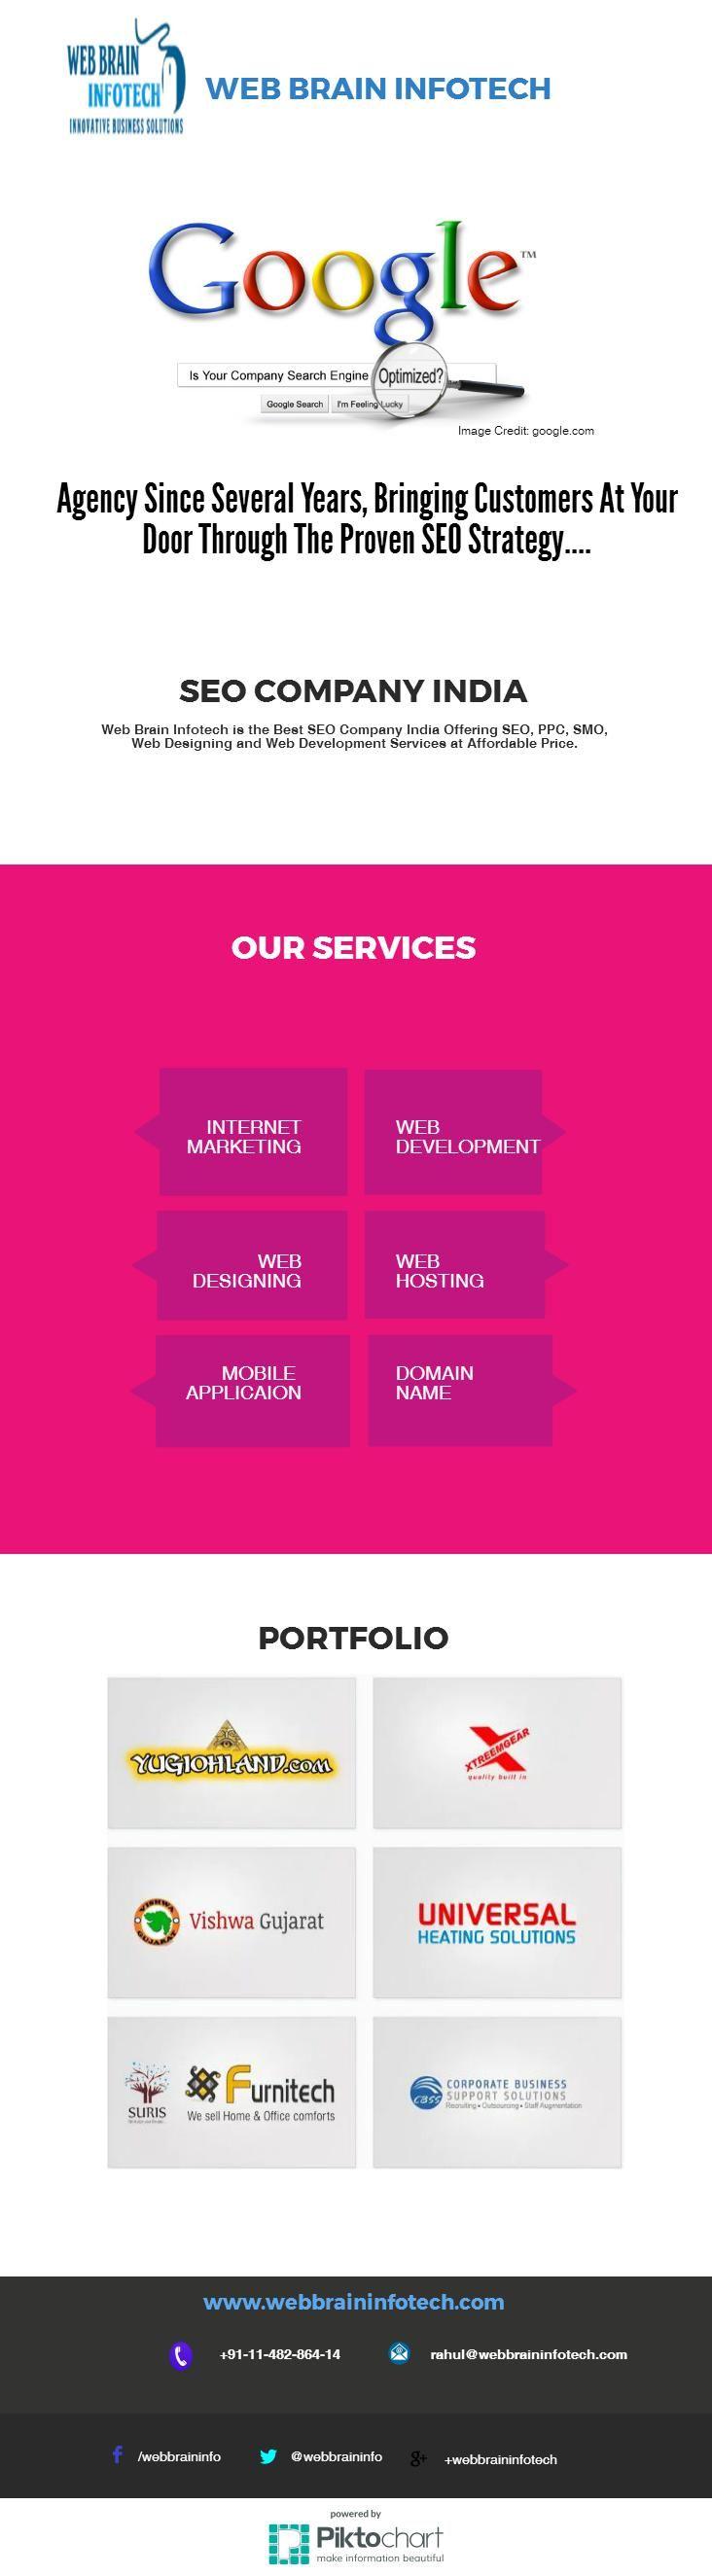 #Best #Seo #Company #India. Web Brain Infotech